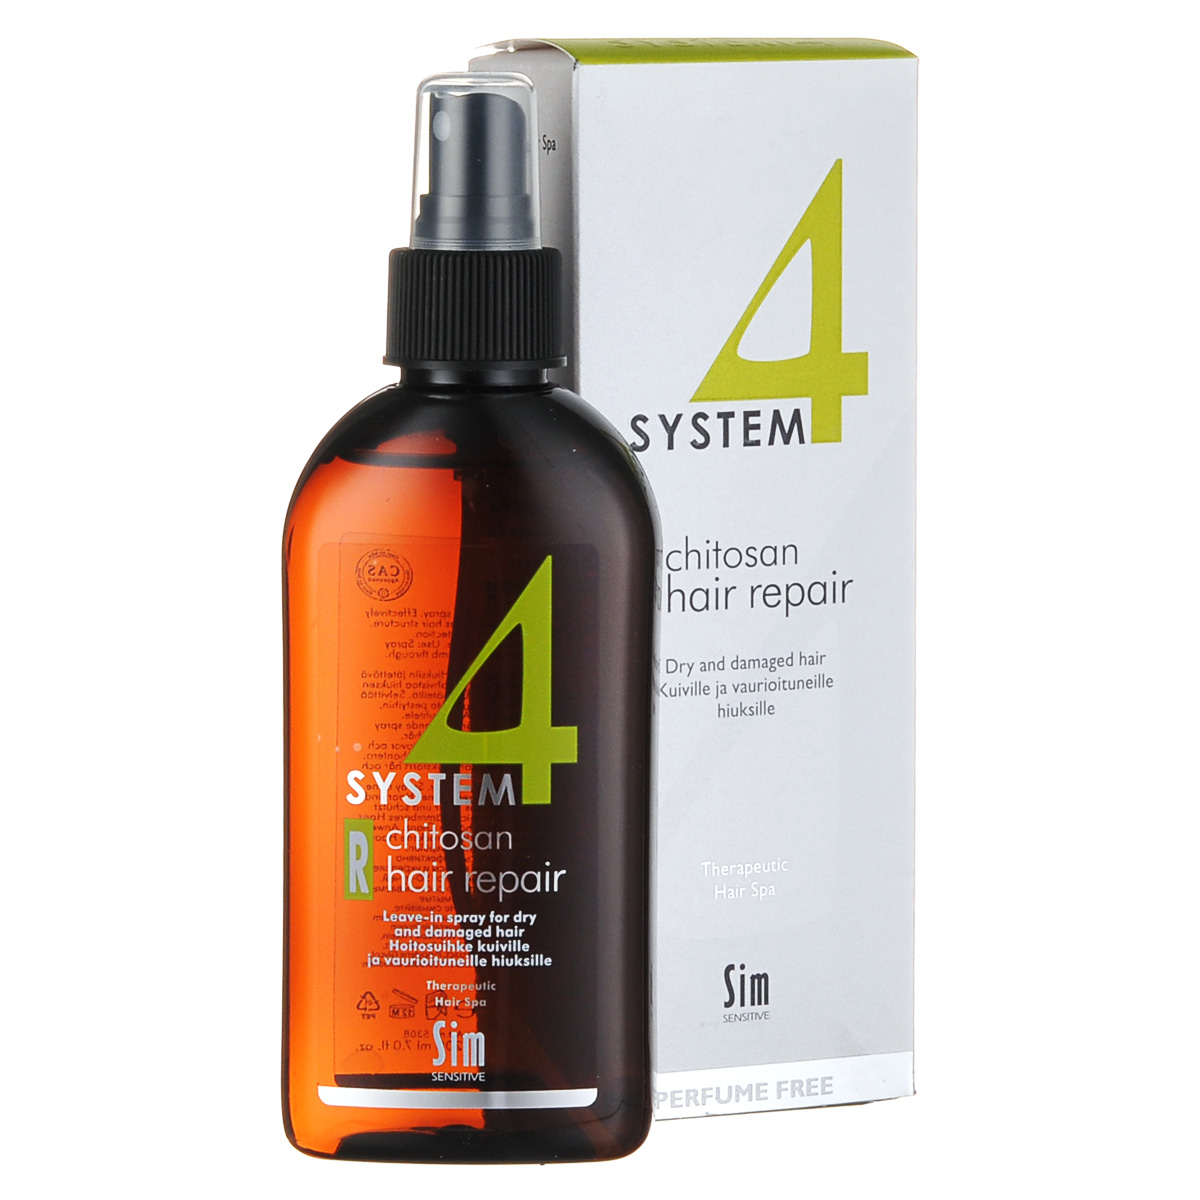 SIM SENSITIVE Восстановление волос